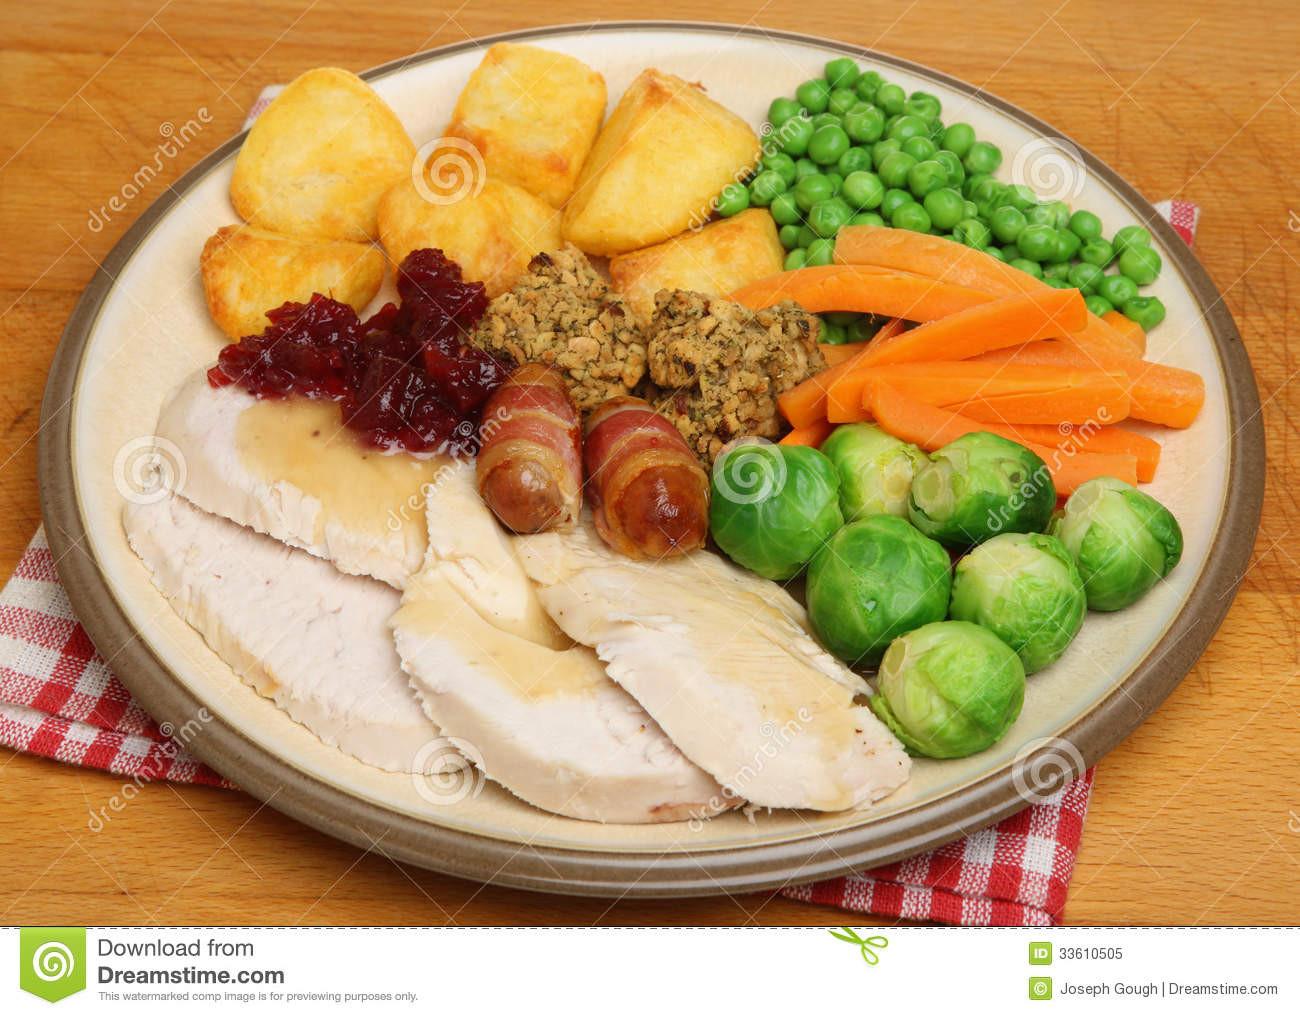 Christmas Dinner Vegetables  Christmas Dinner Roast Turkey Stock Image Image of